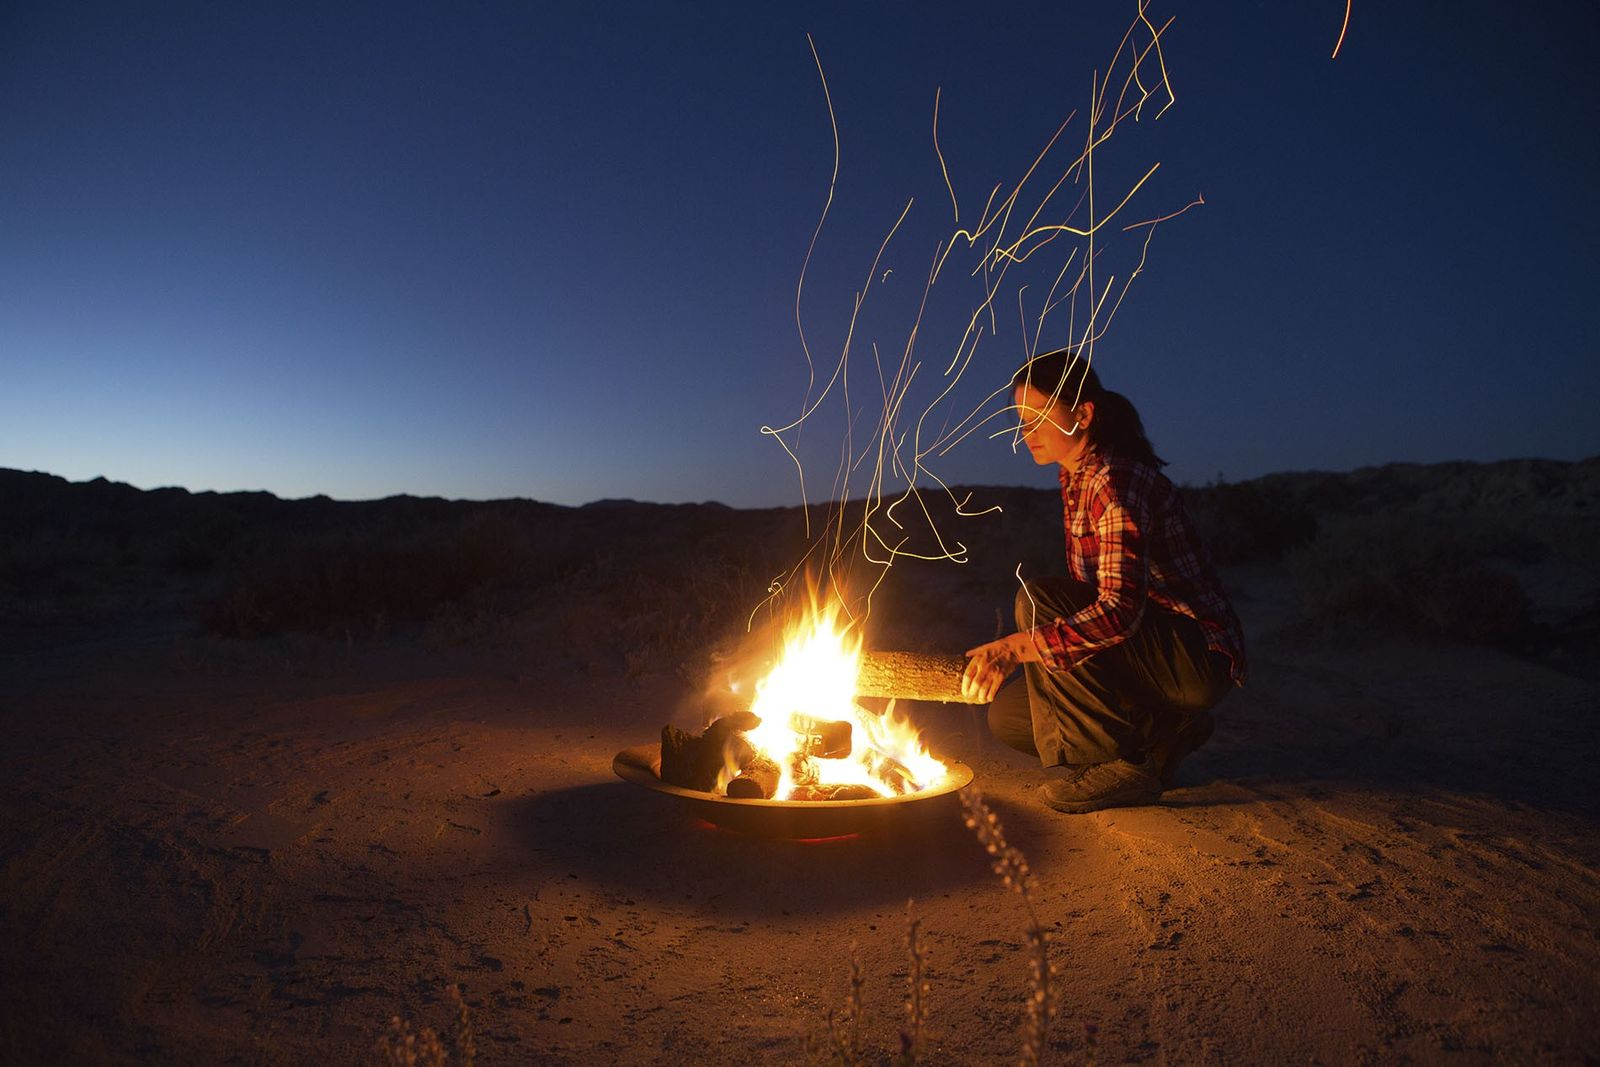 Campfire in California desert